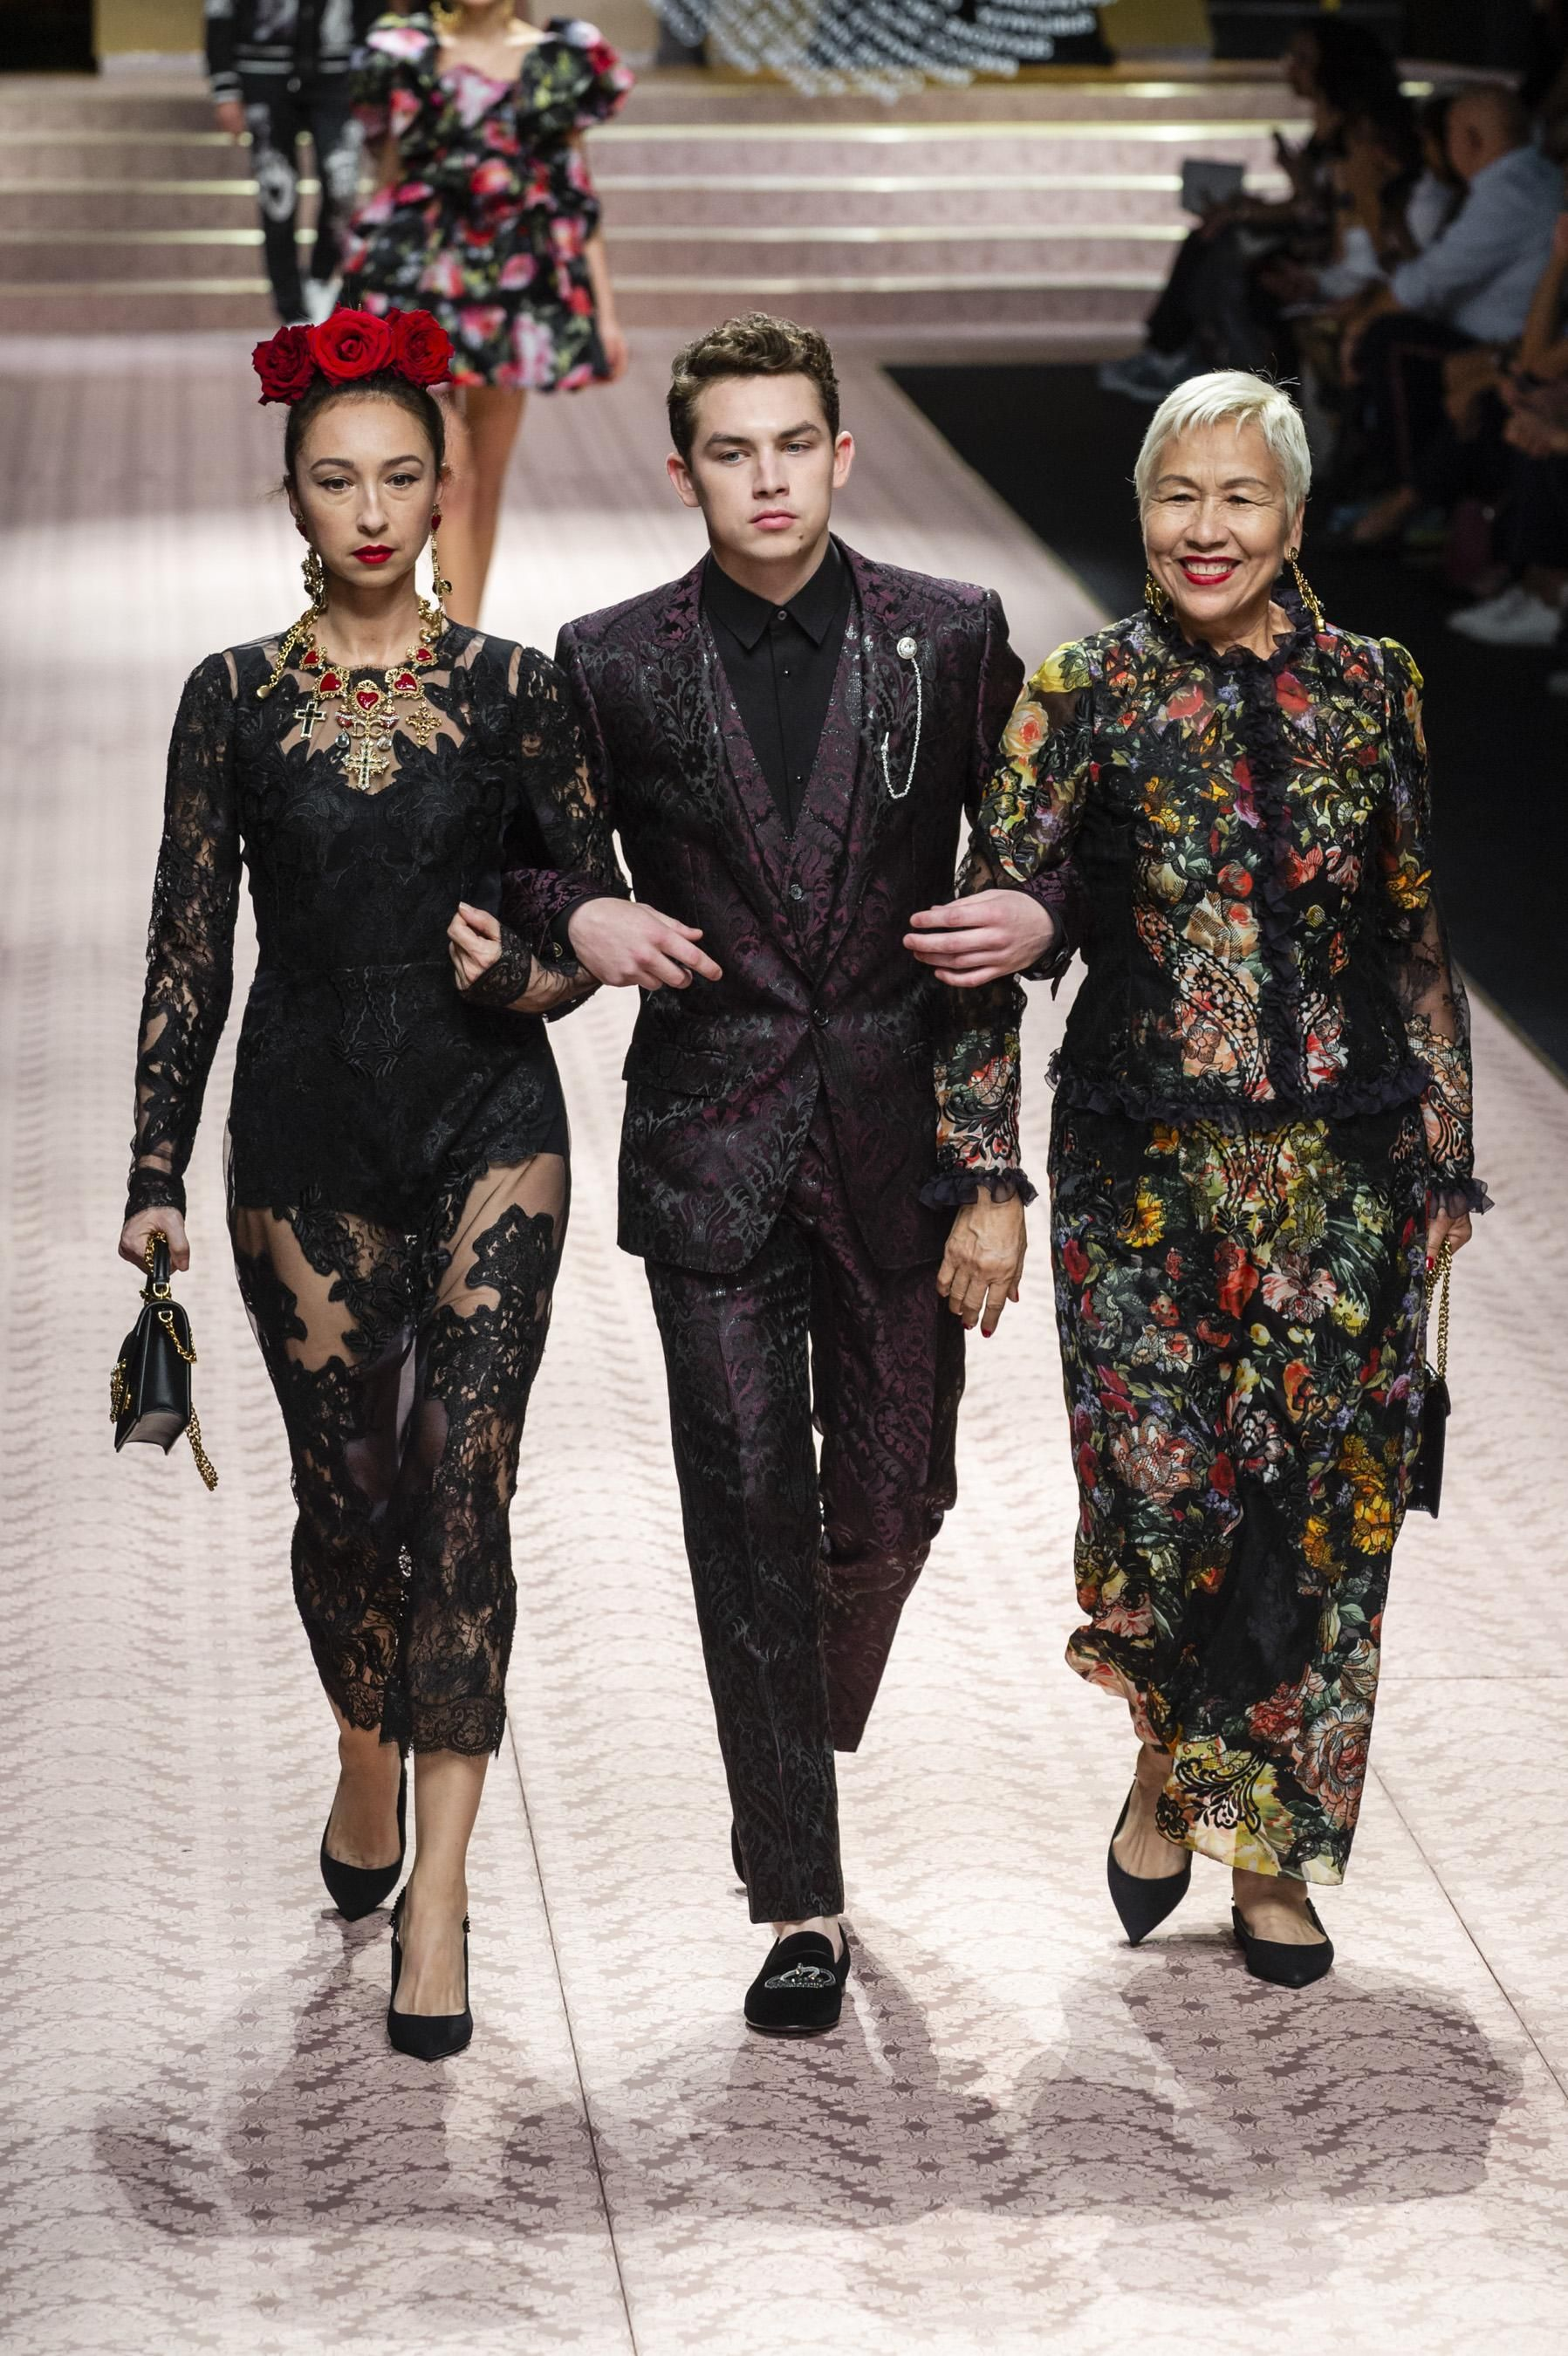 b3740795f3 Défilé Dolce & Gabbana printemps-été 2019 Prêt-à-porter - Madame Figaro